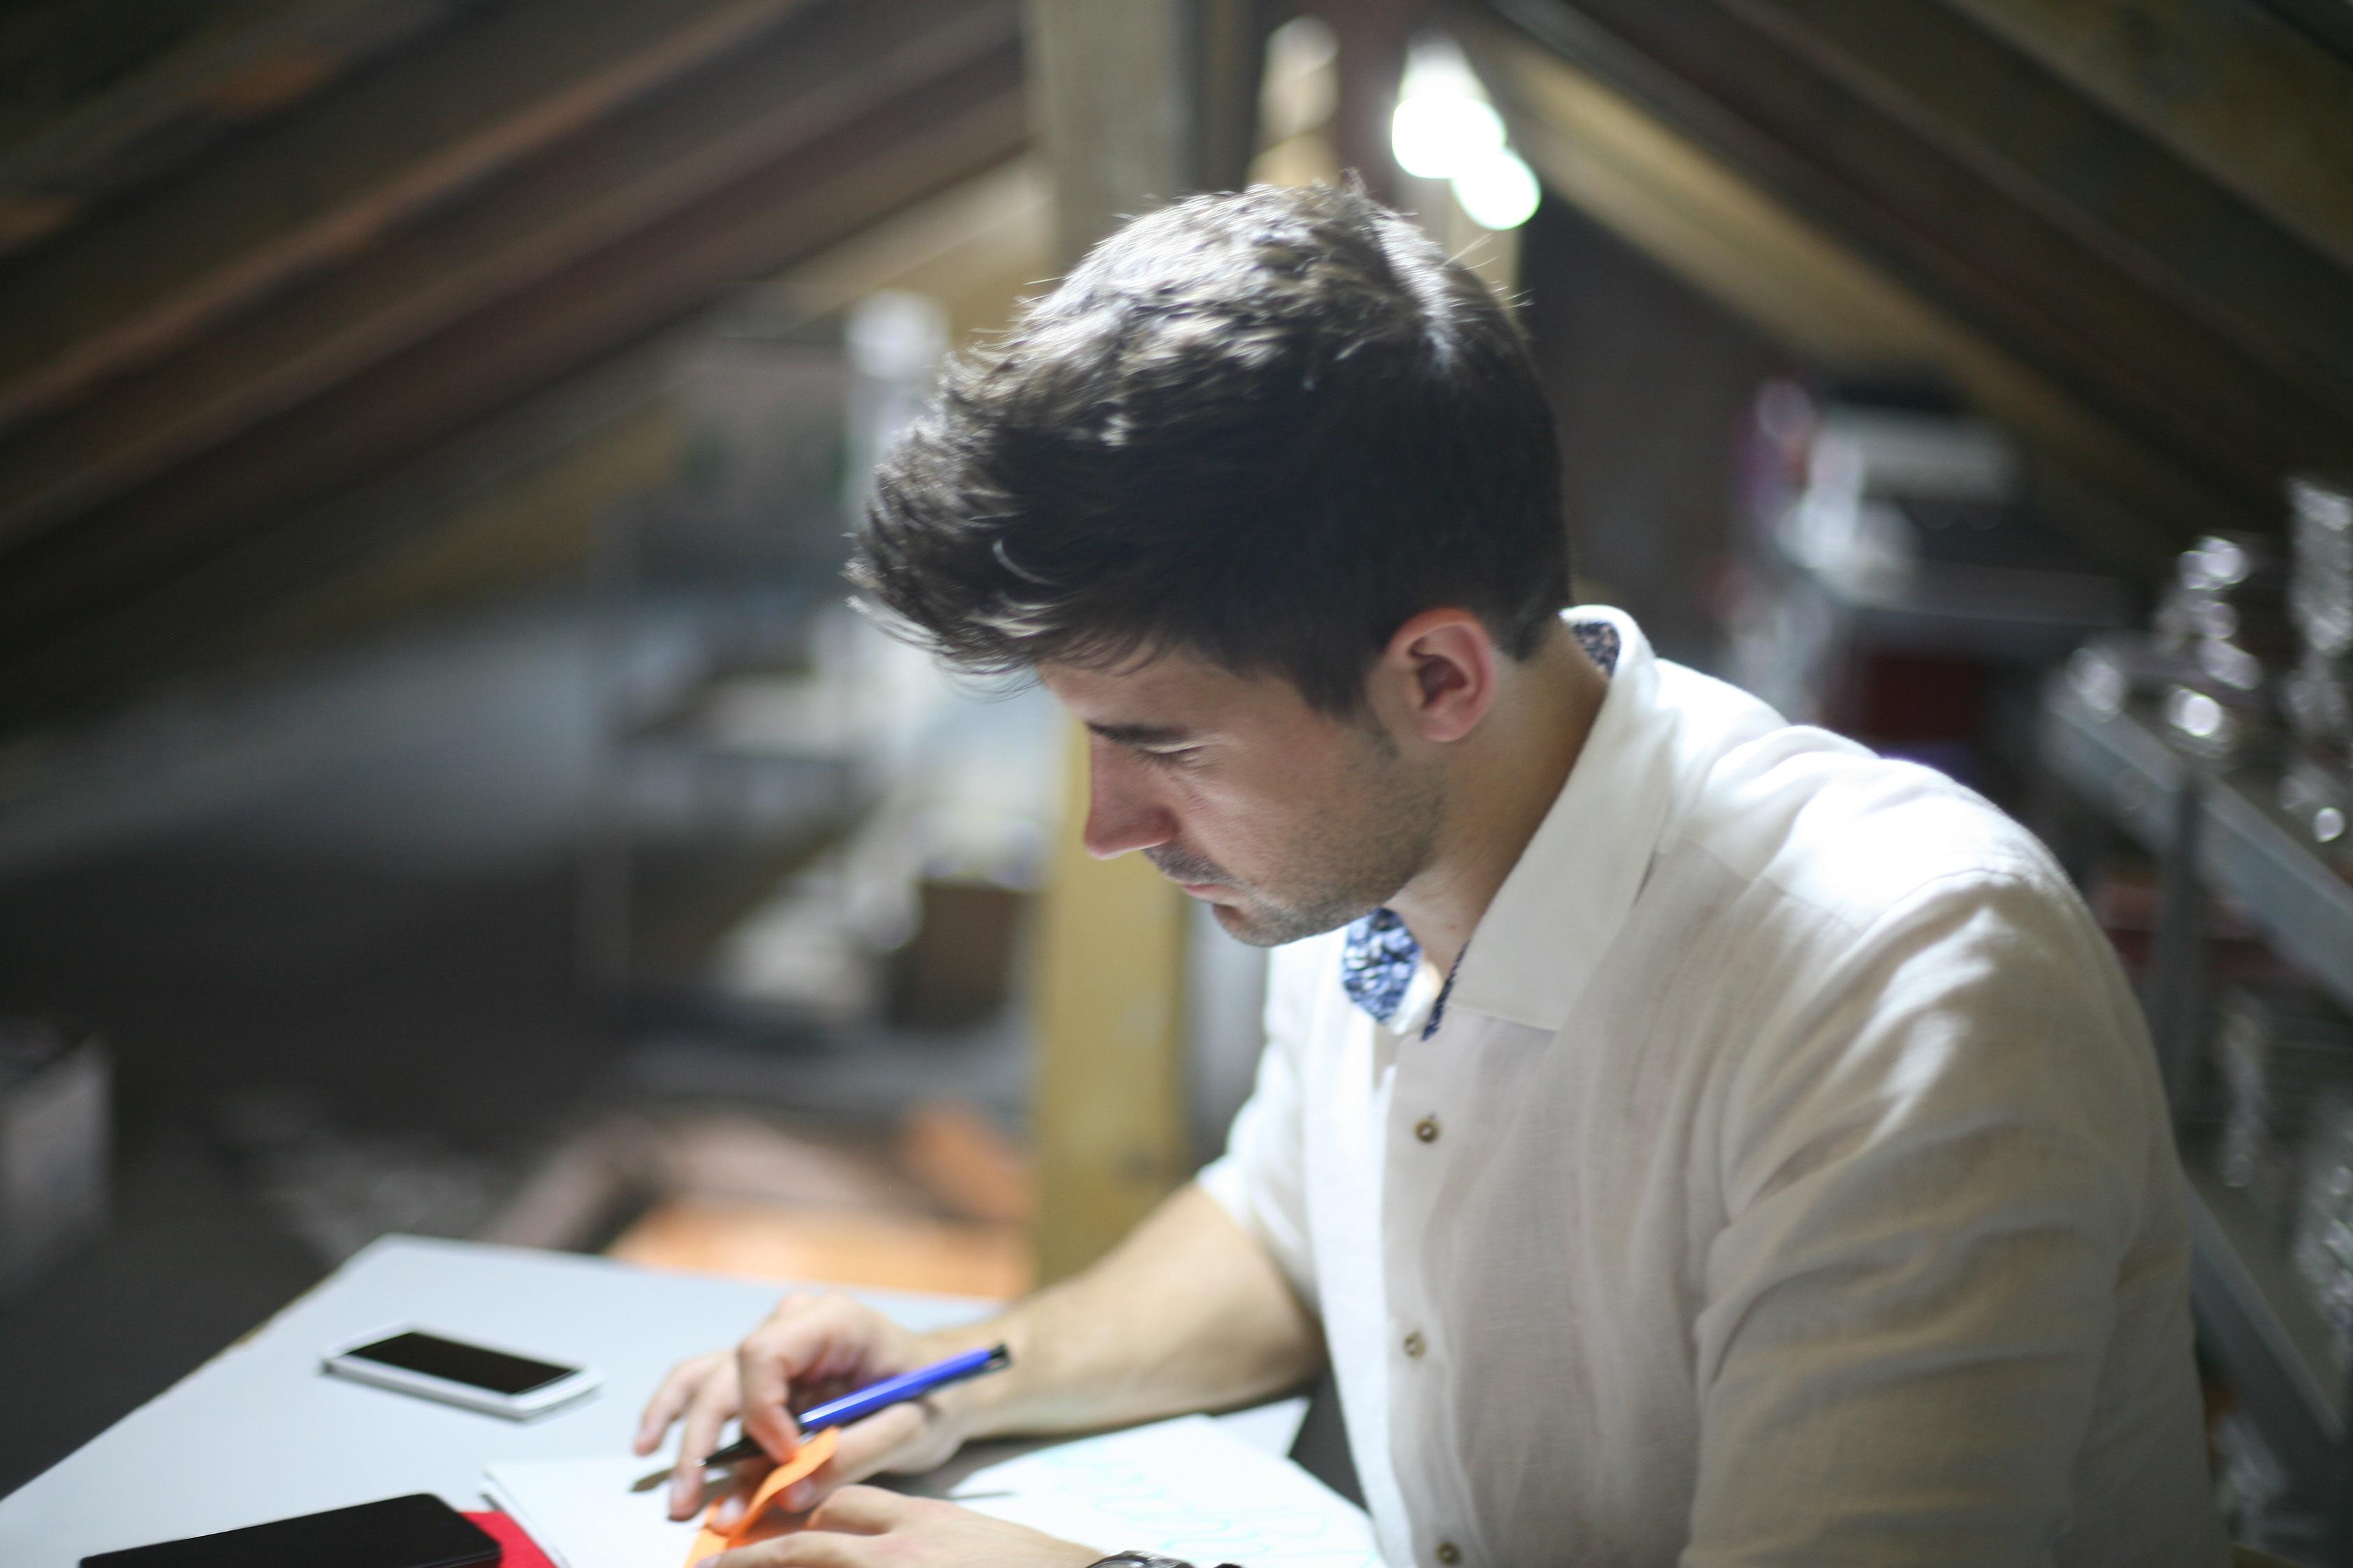 Businessman working hard at his desk